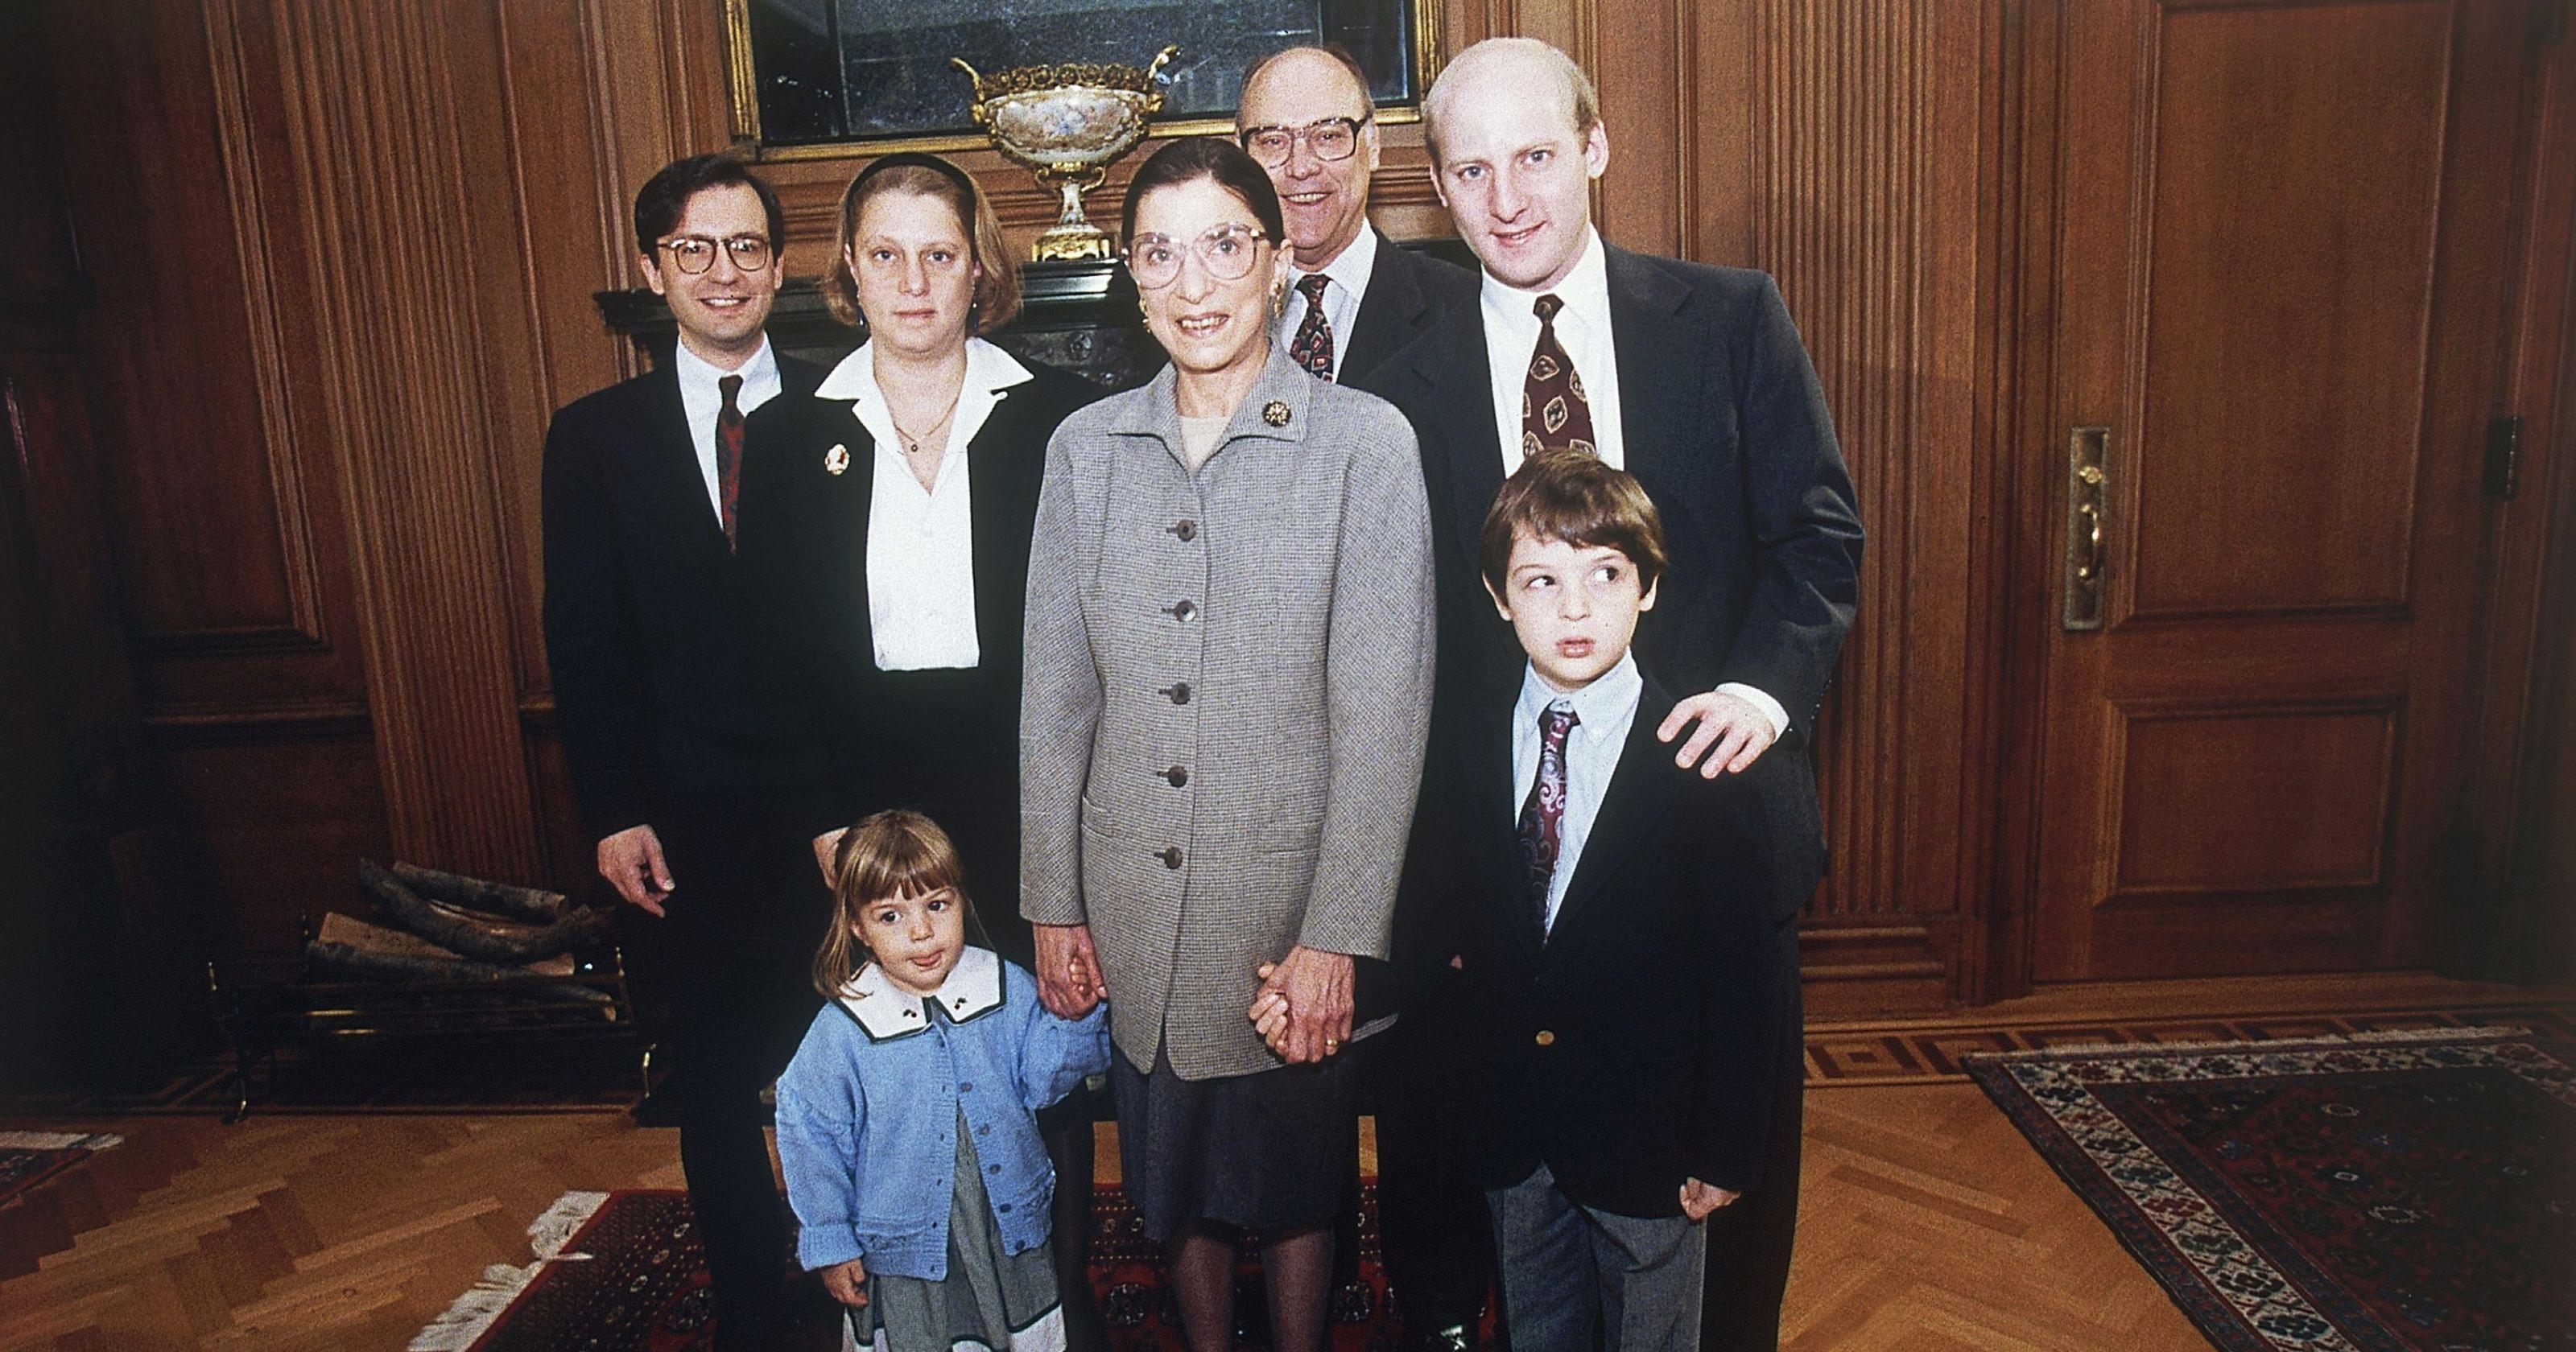 636220759965093959-AP-Ruth-Bader-Ginsburg-with-his-family